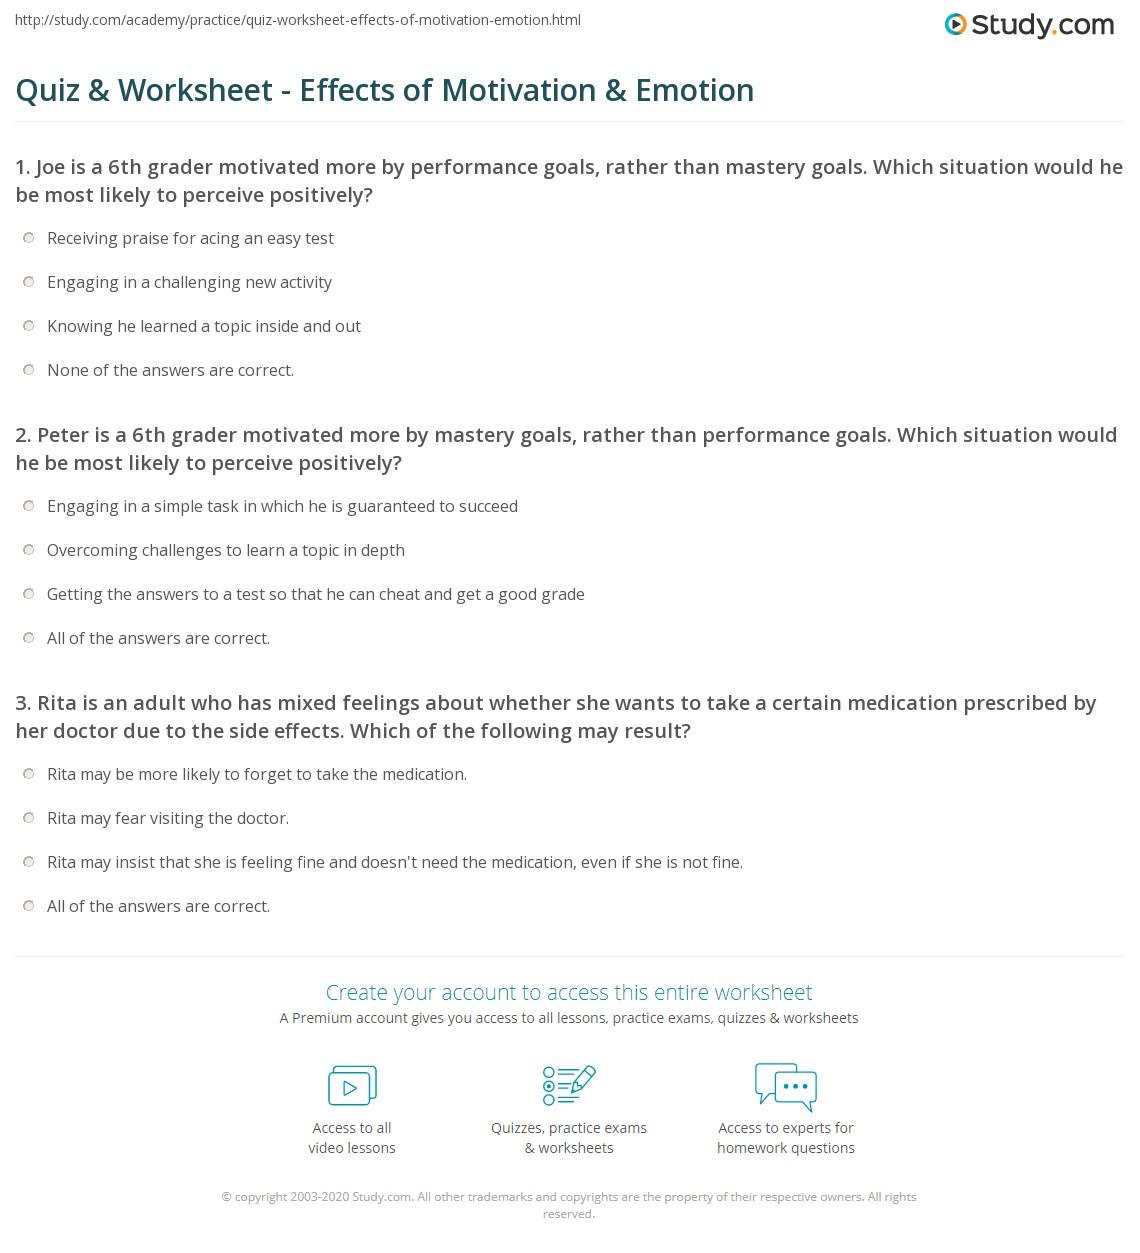 Quiz & Worksheet - Effects of Motivation & Emotion  Study.com